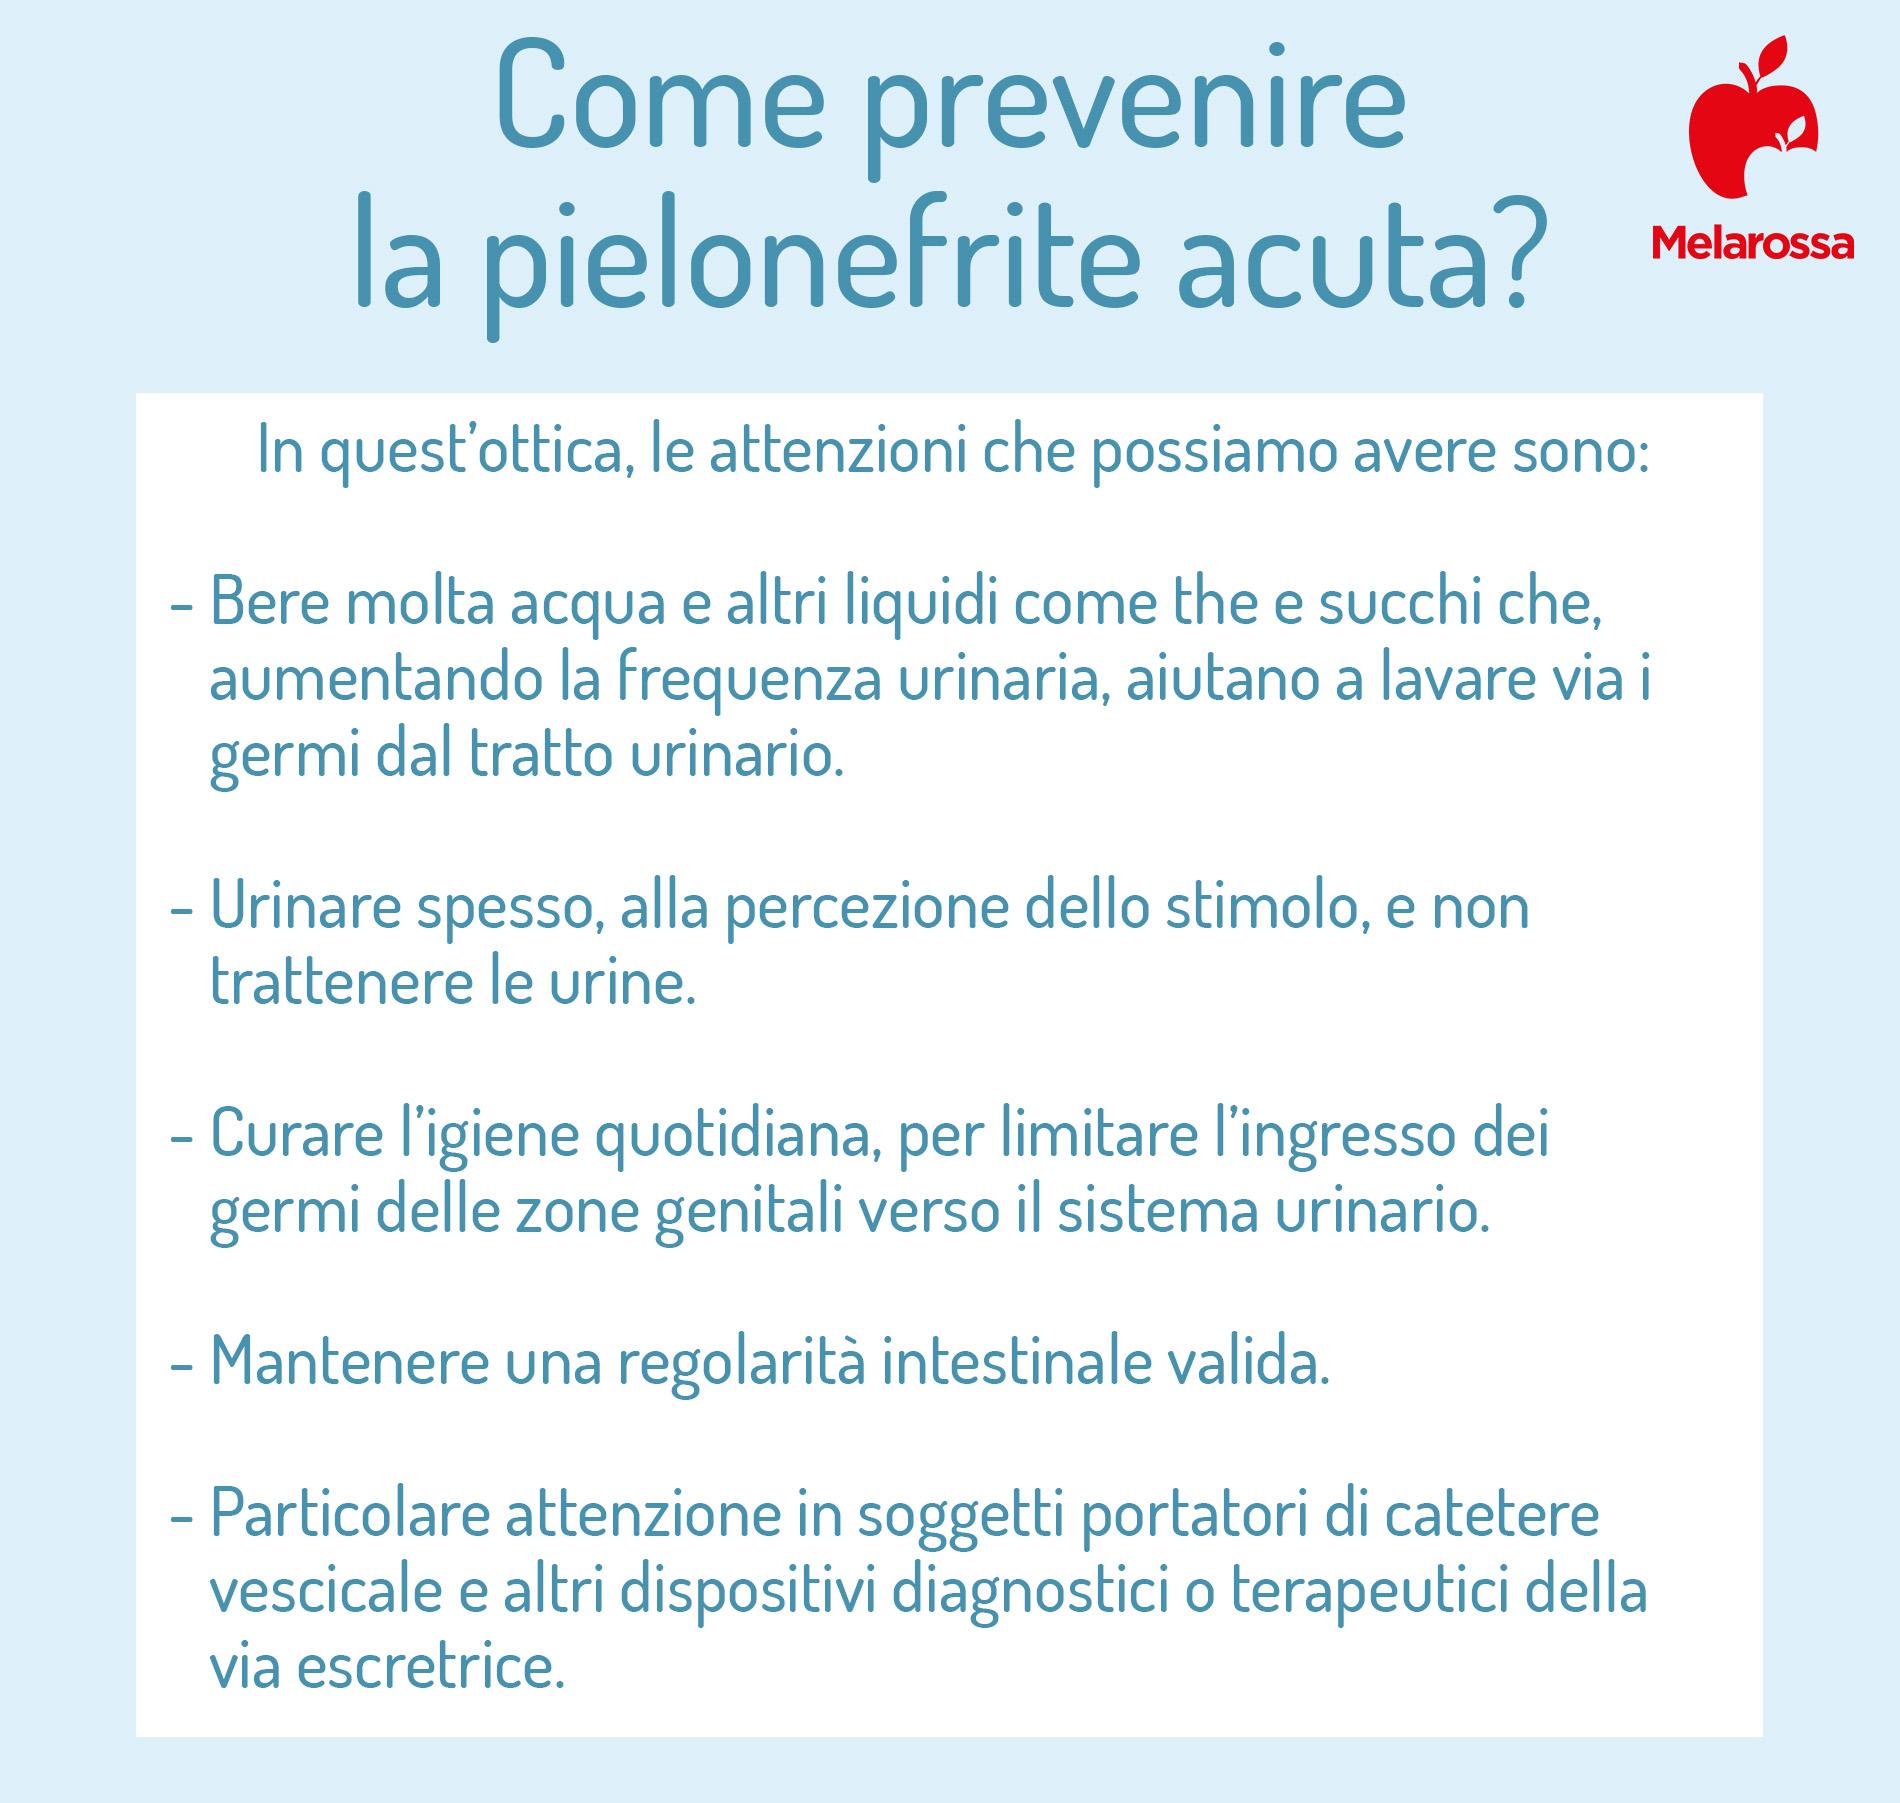 pielonefrite acuta: prevenzione